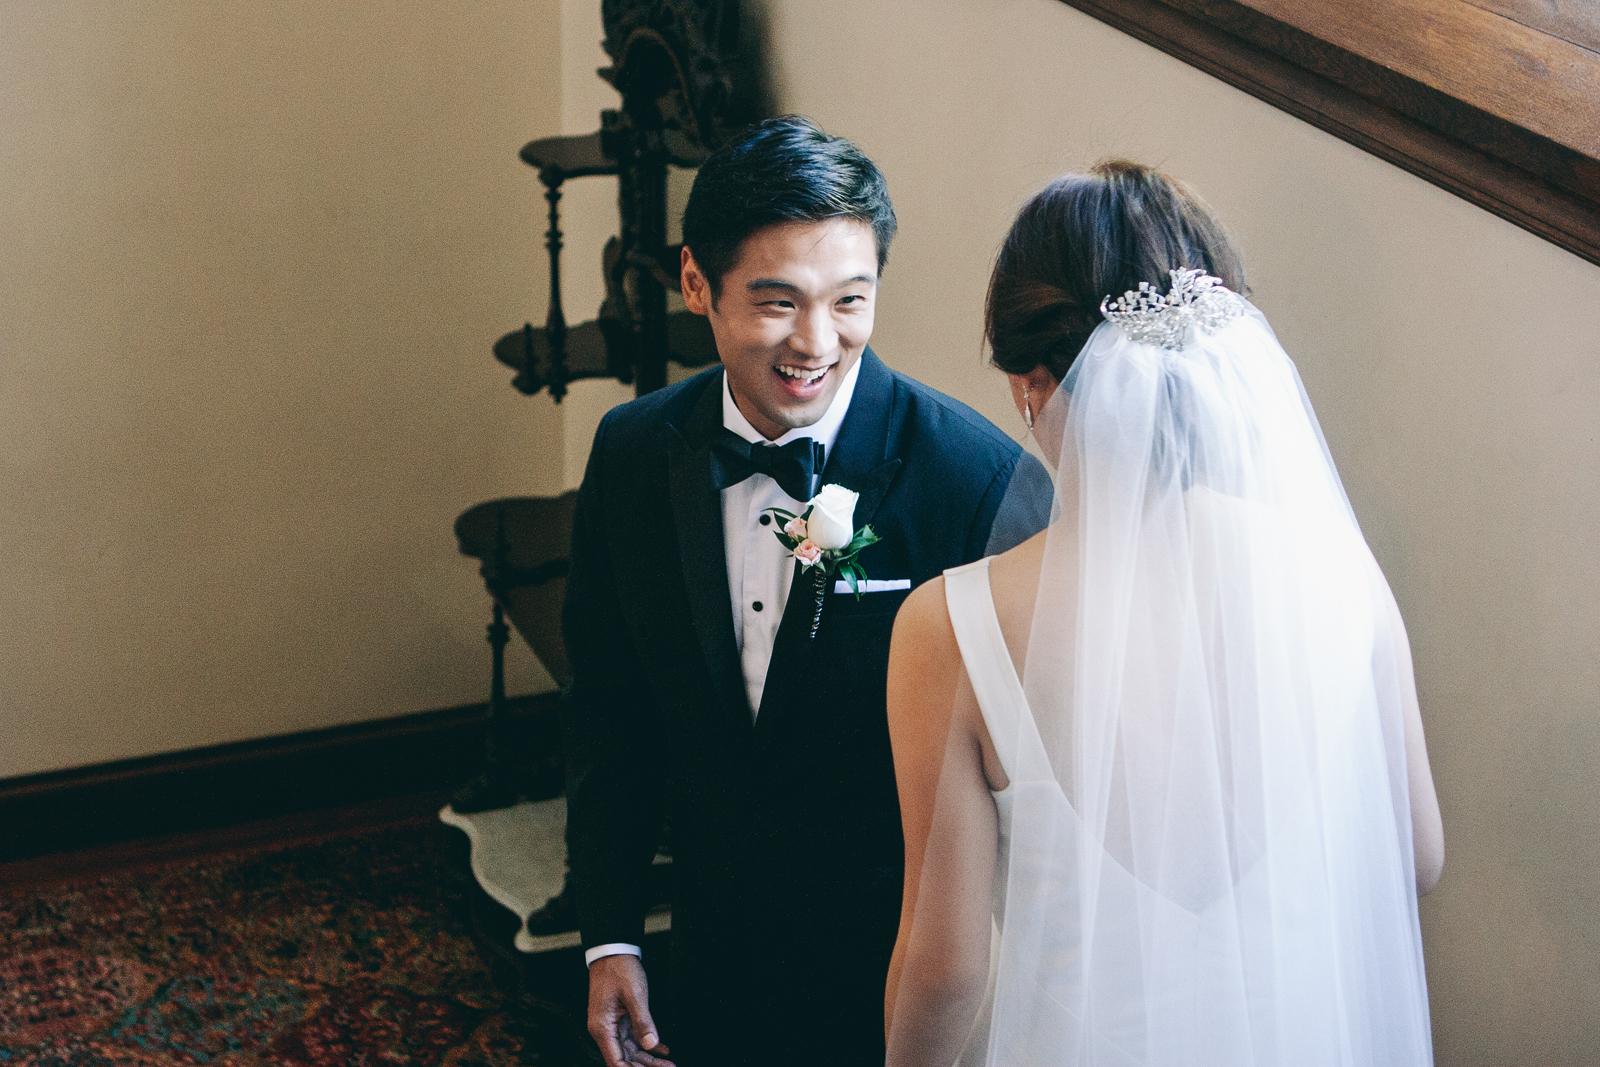 kohl_manison_wedding_photography_sarah_eric_ebony_siovhan_bokeh_photography_019.jpg